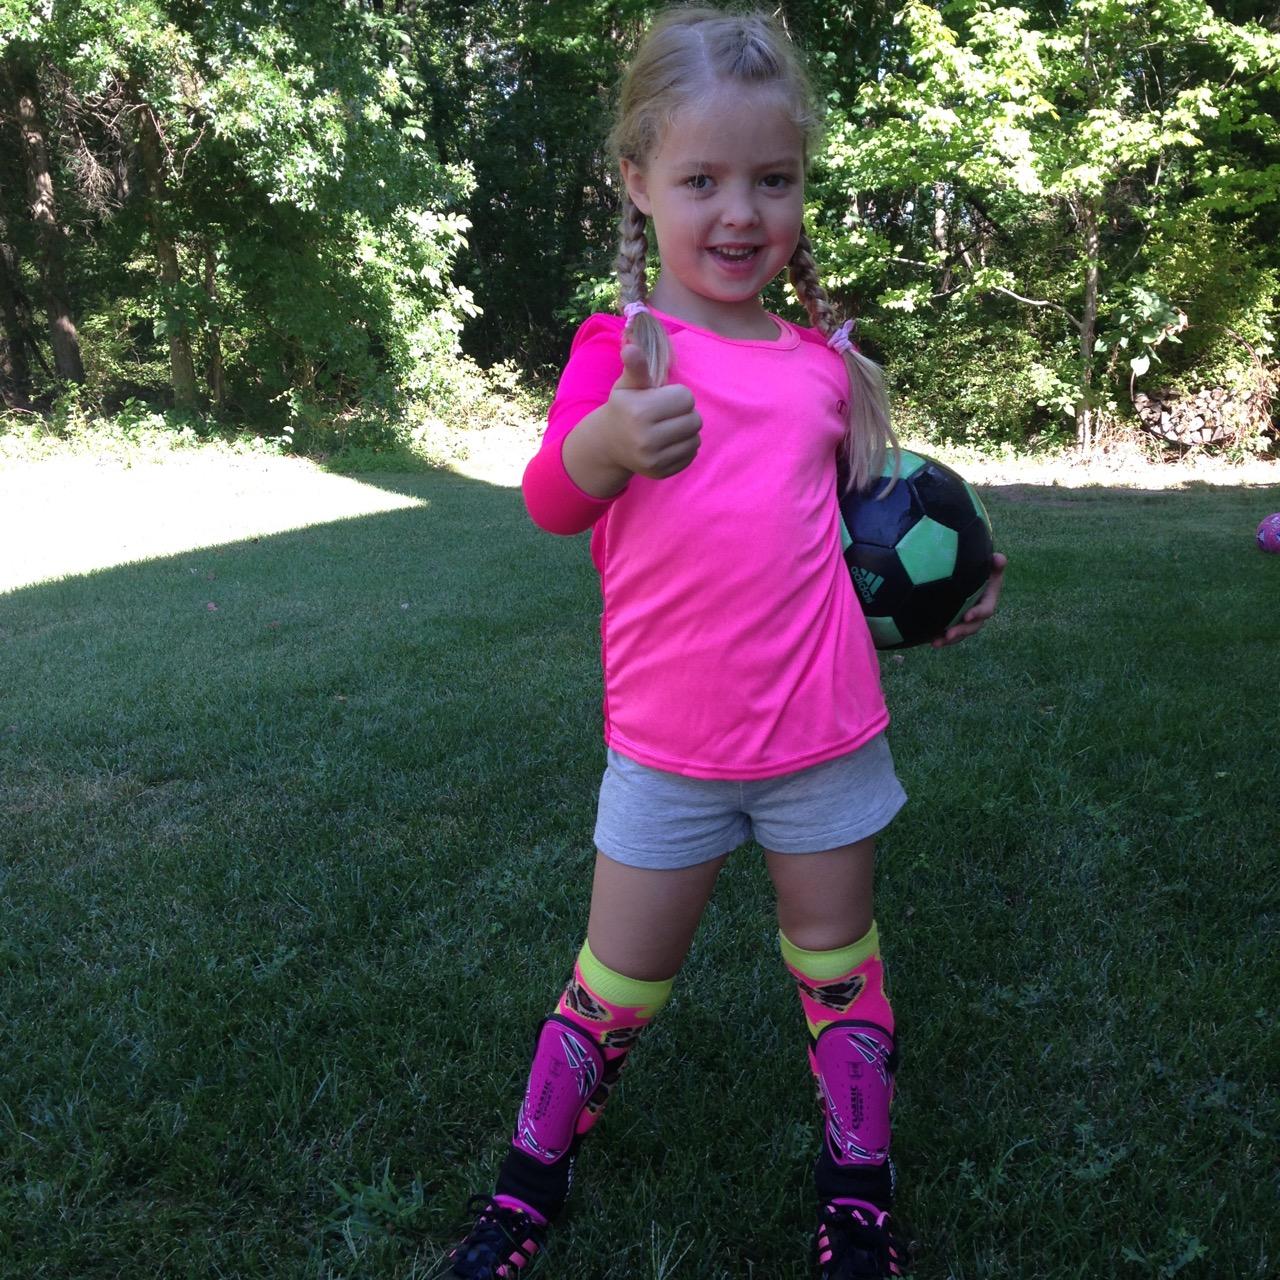 Socks soccer shin guards how to wear